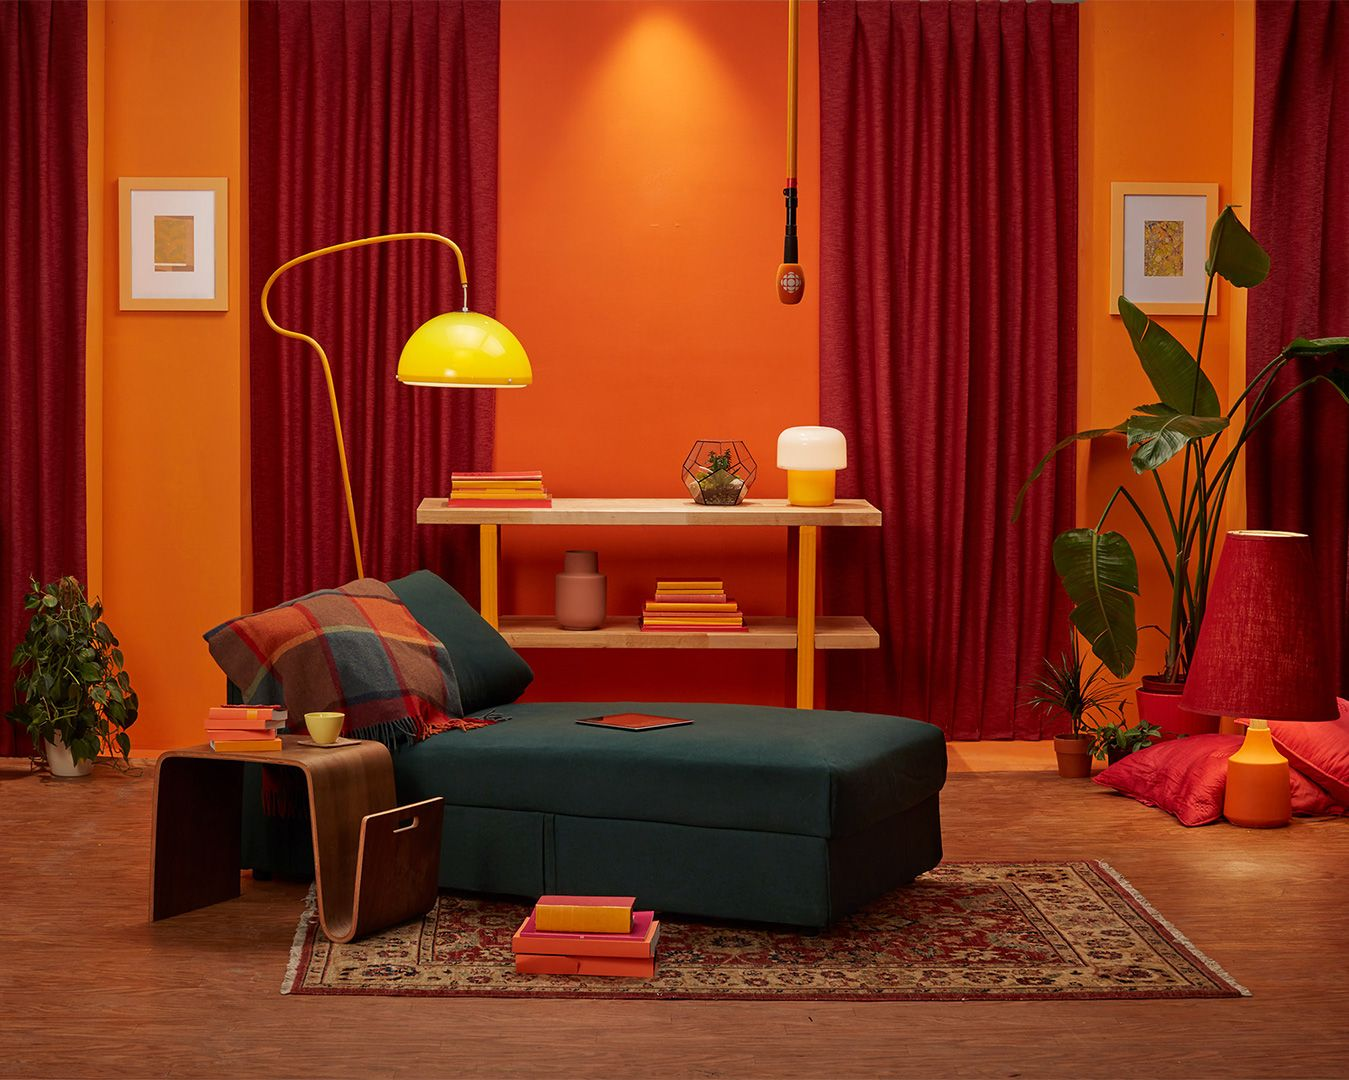 Simon Duhamel's ICI Premiere photoshoot living room set